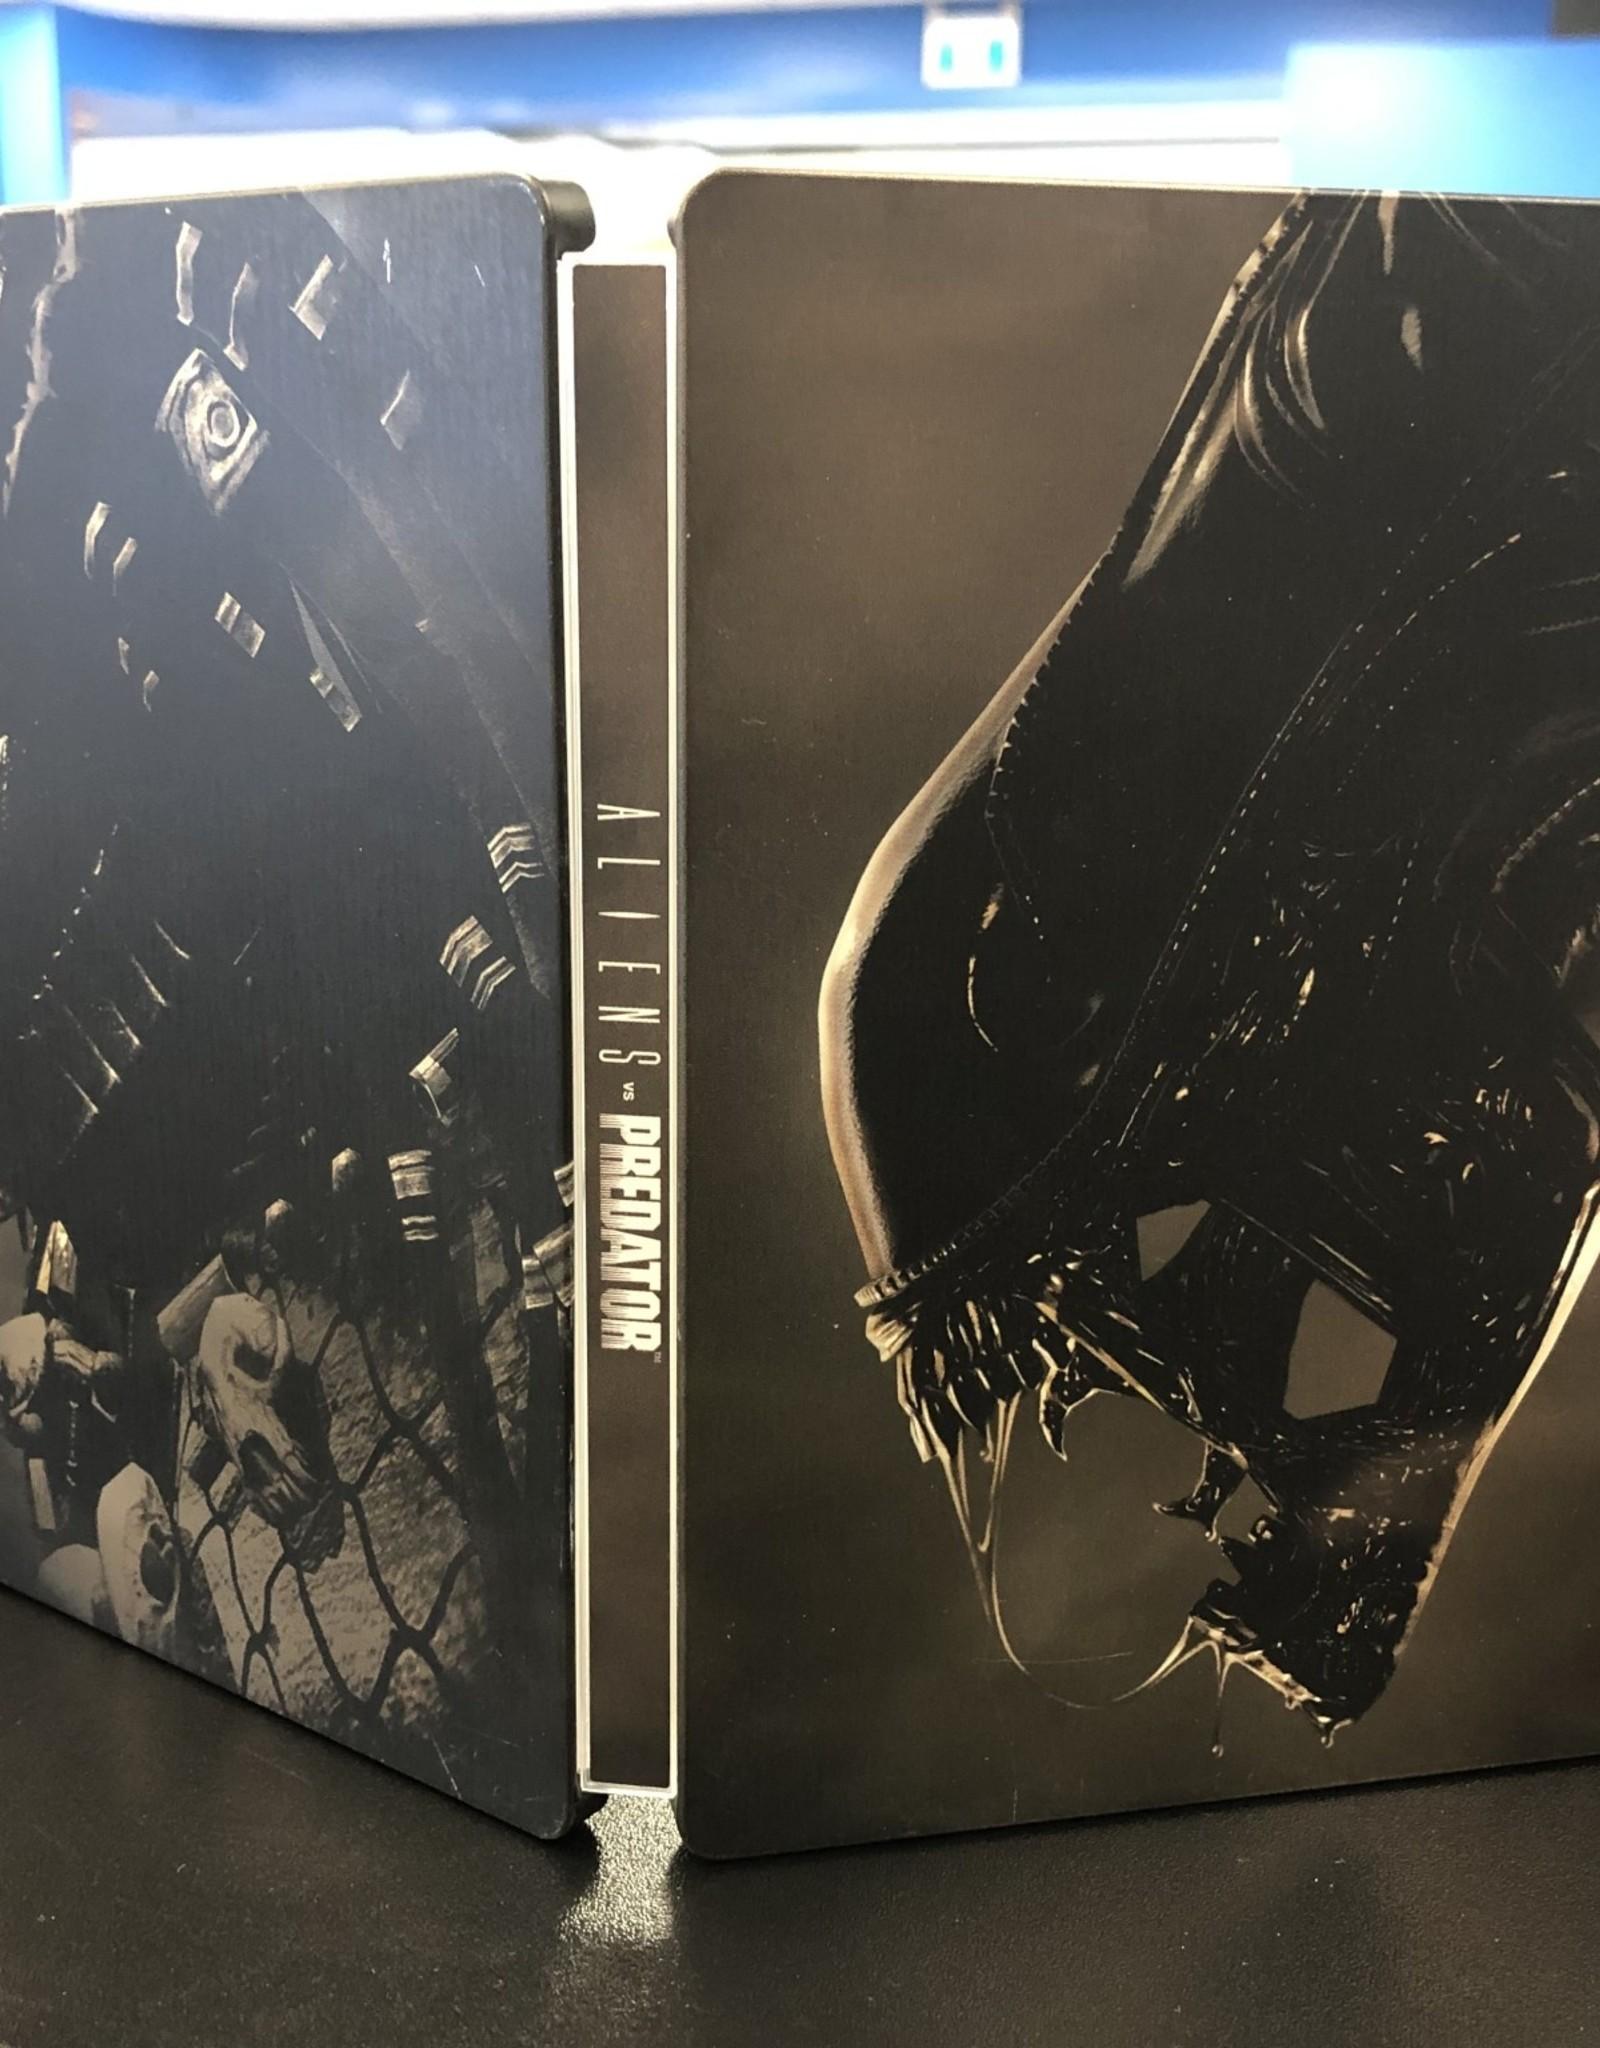 Playstation 3 Aliens vs. Predator (Steelbook)